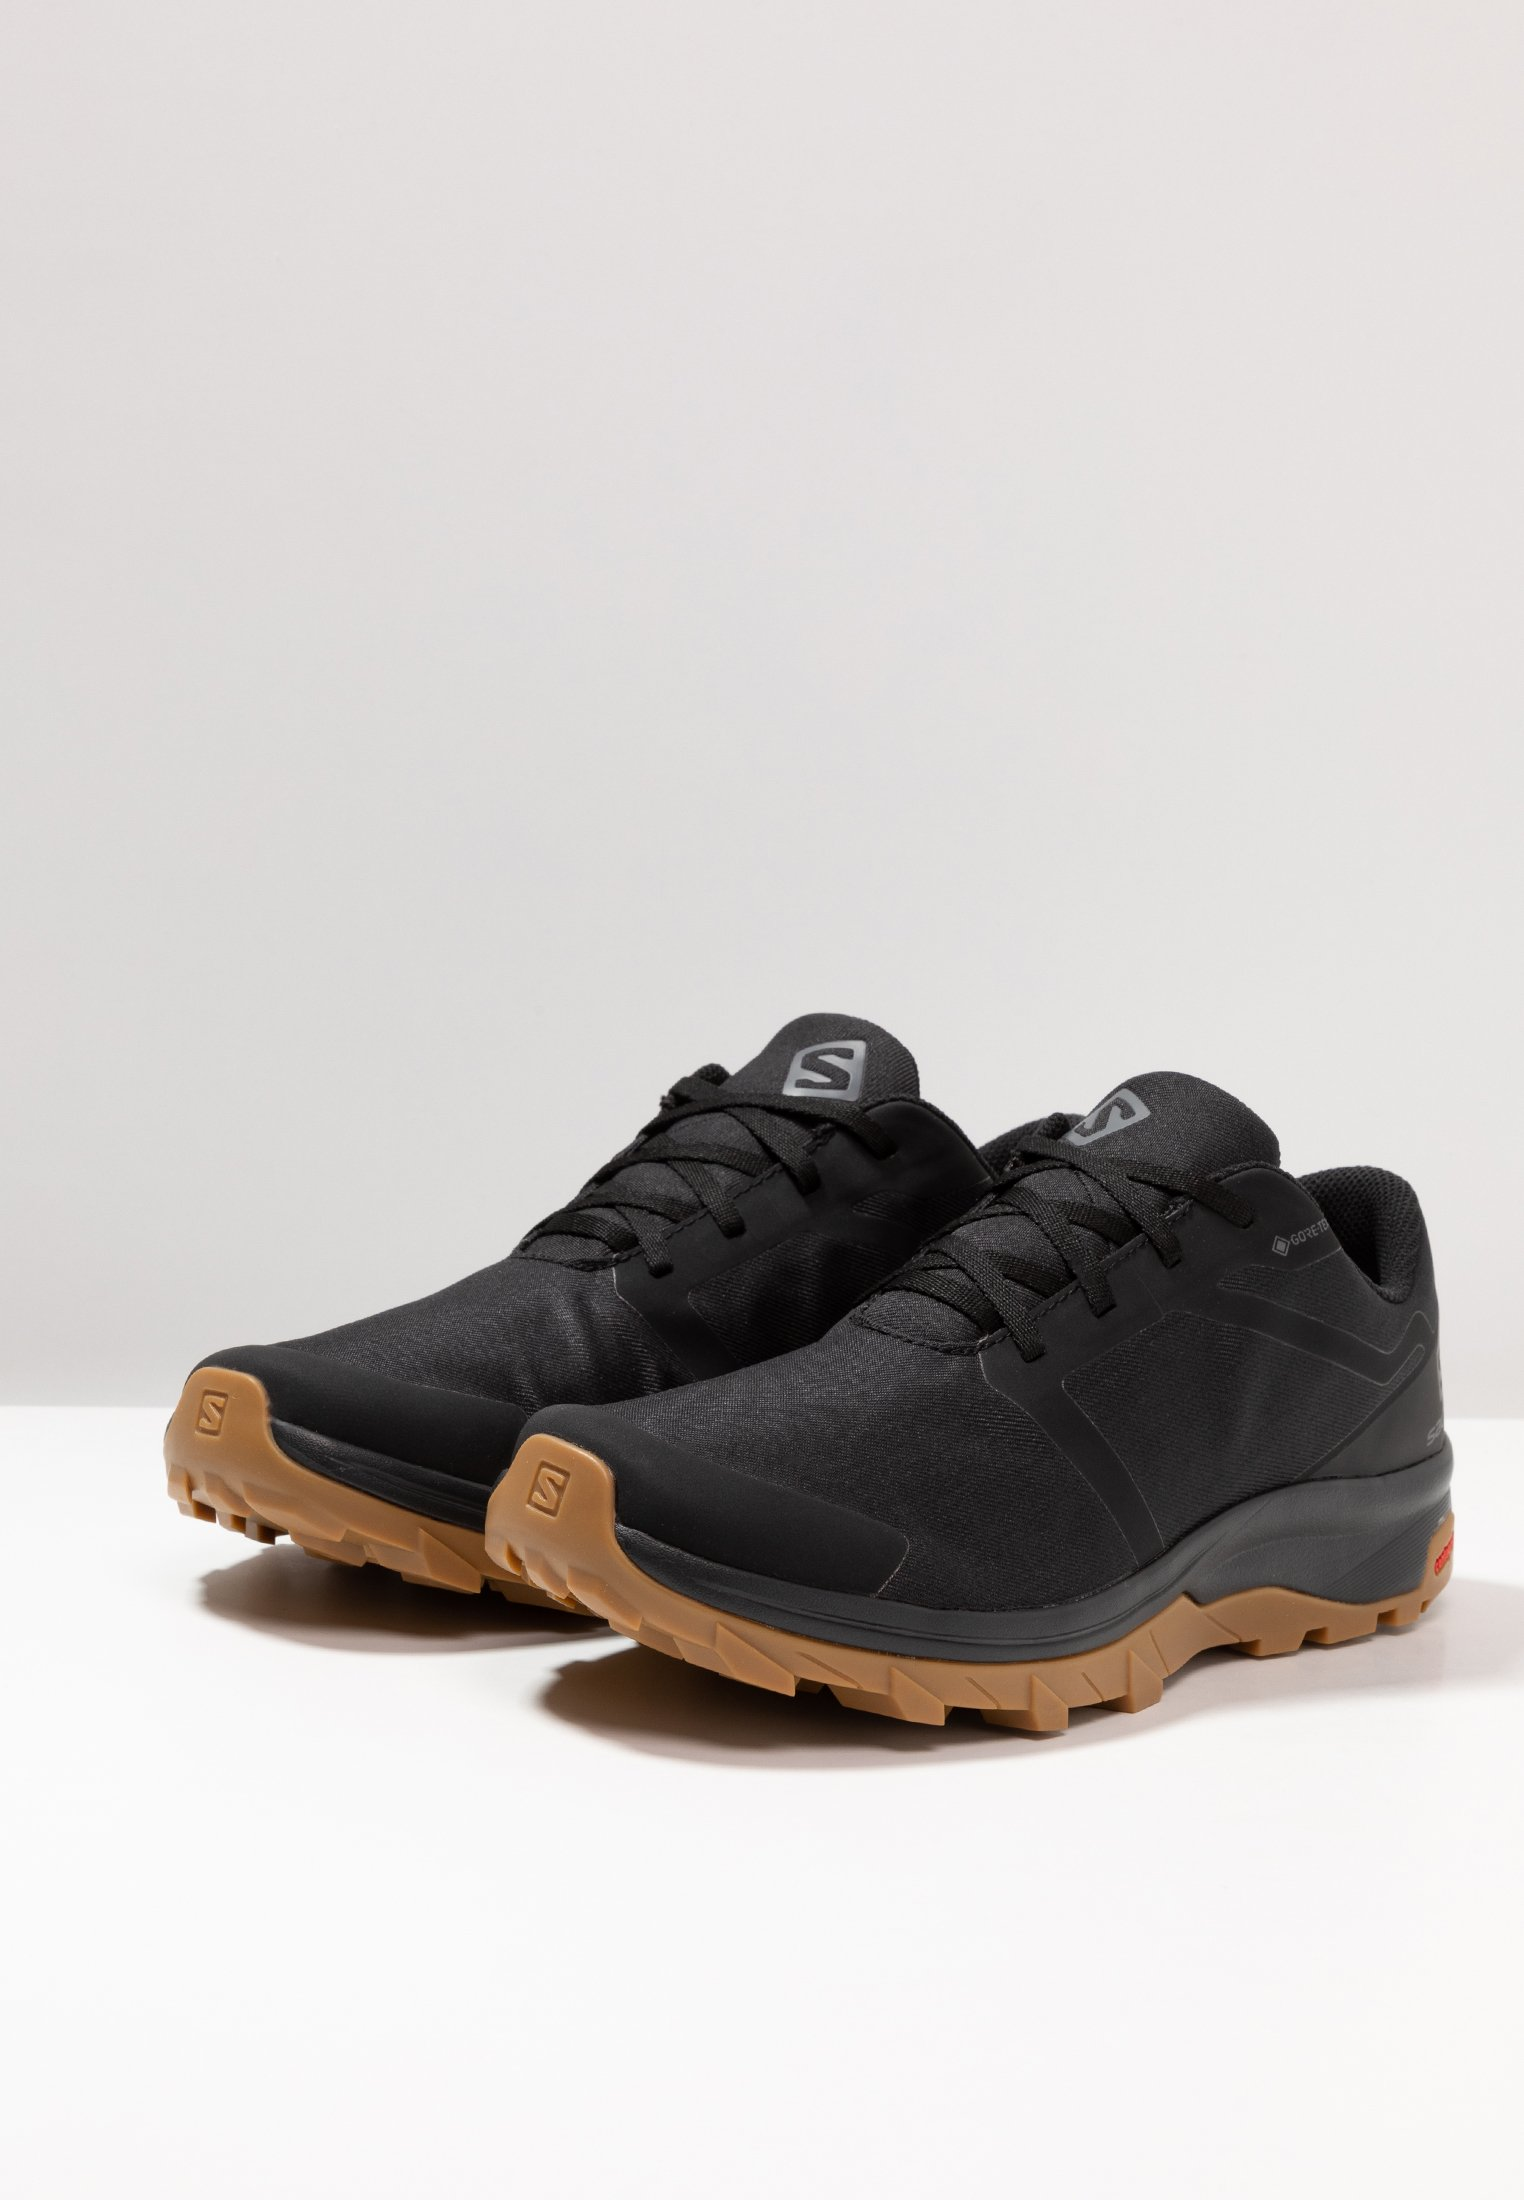 OUTBOUND GTX Hikingskor black